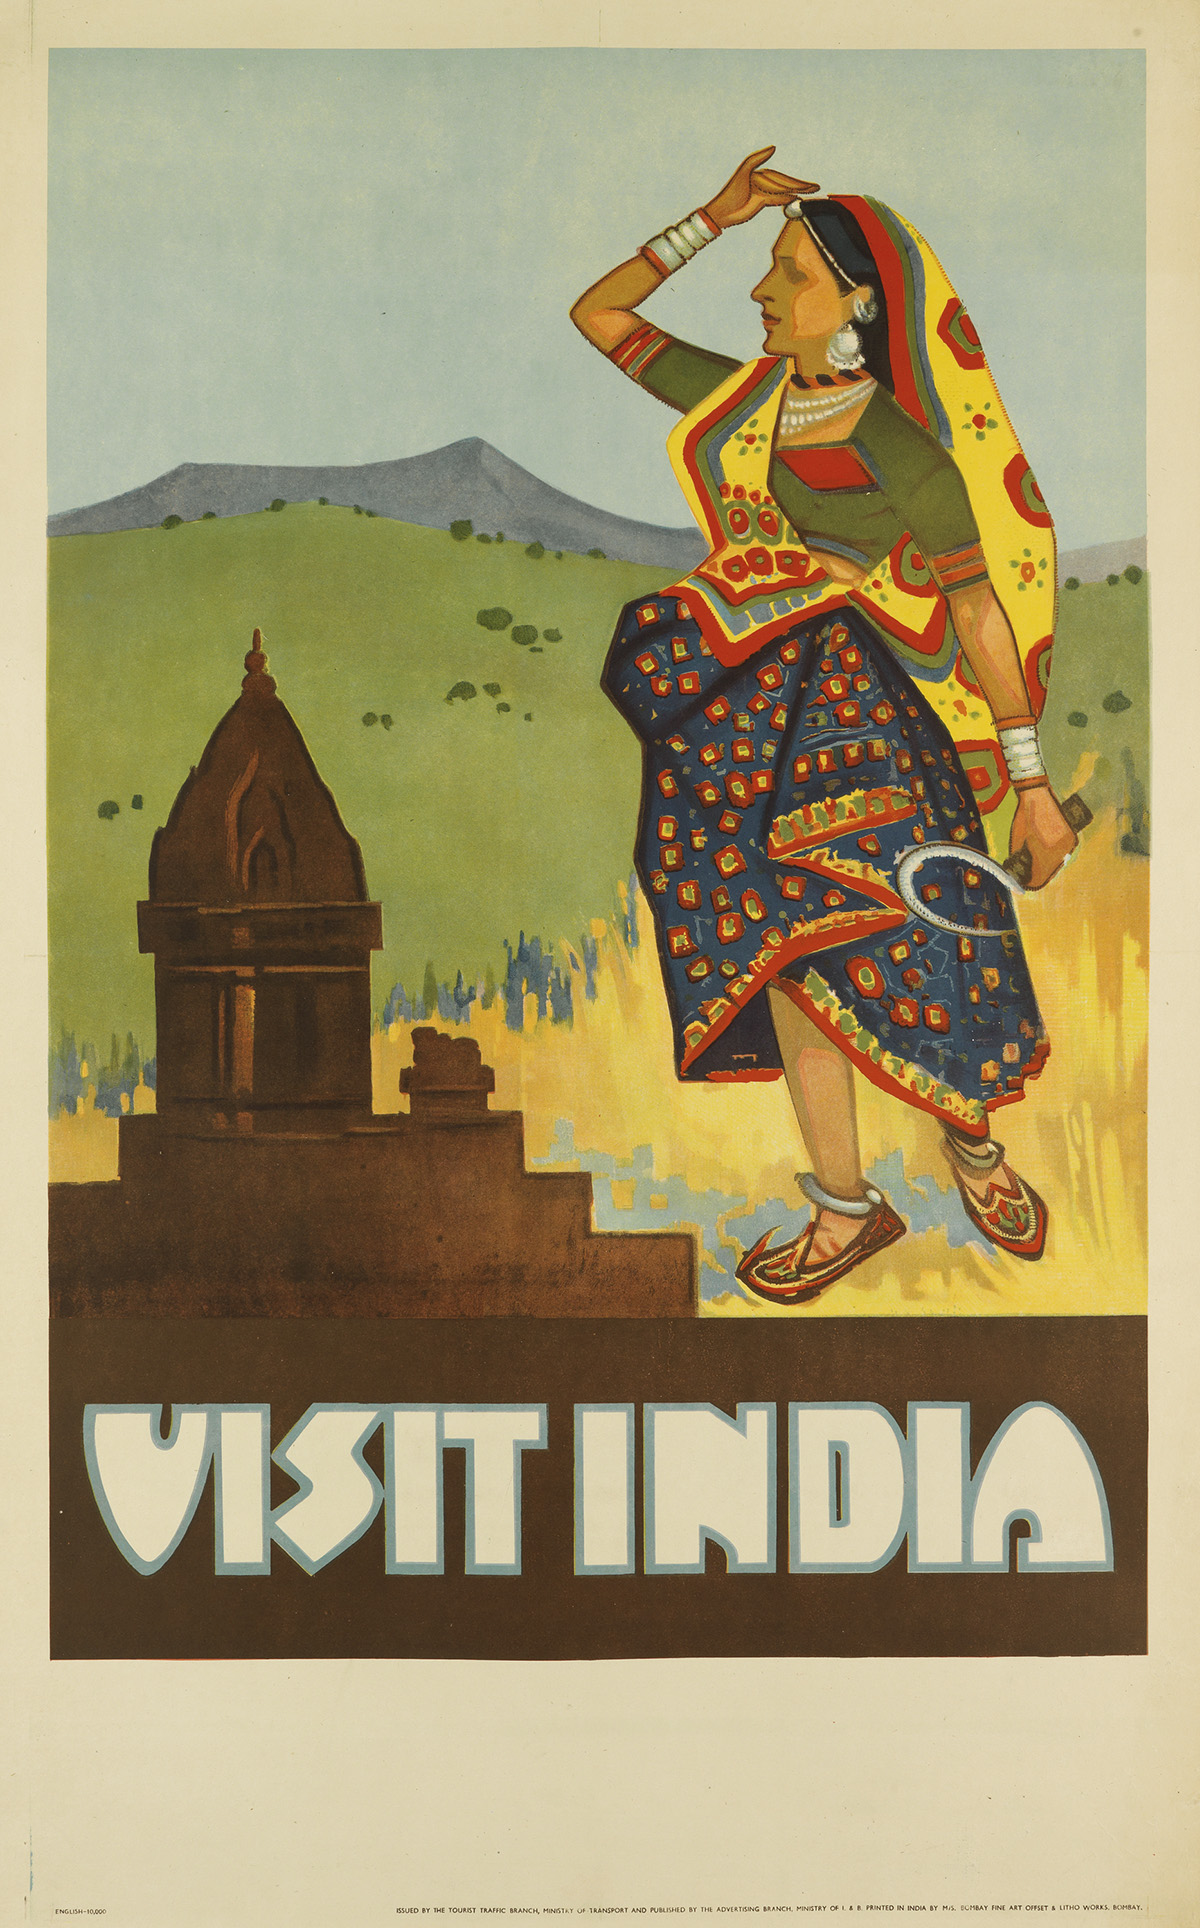 DESIGNER-UNKNOWN-VISIT-INDIA-40x25-inches-103x63-cm-Bombay-F